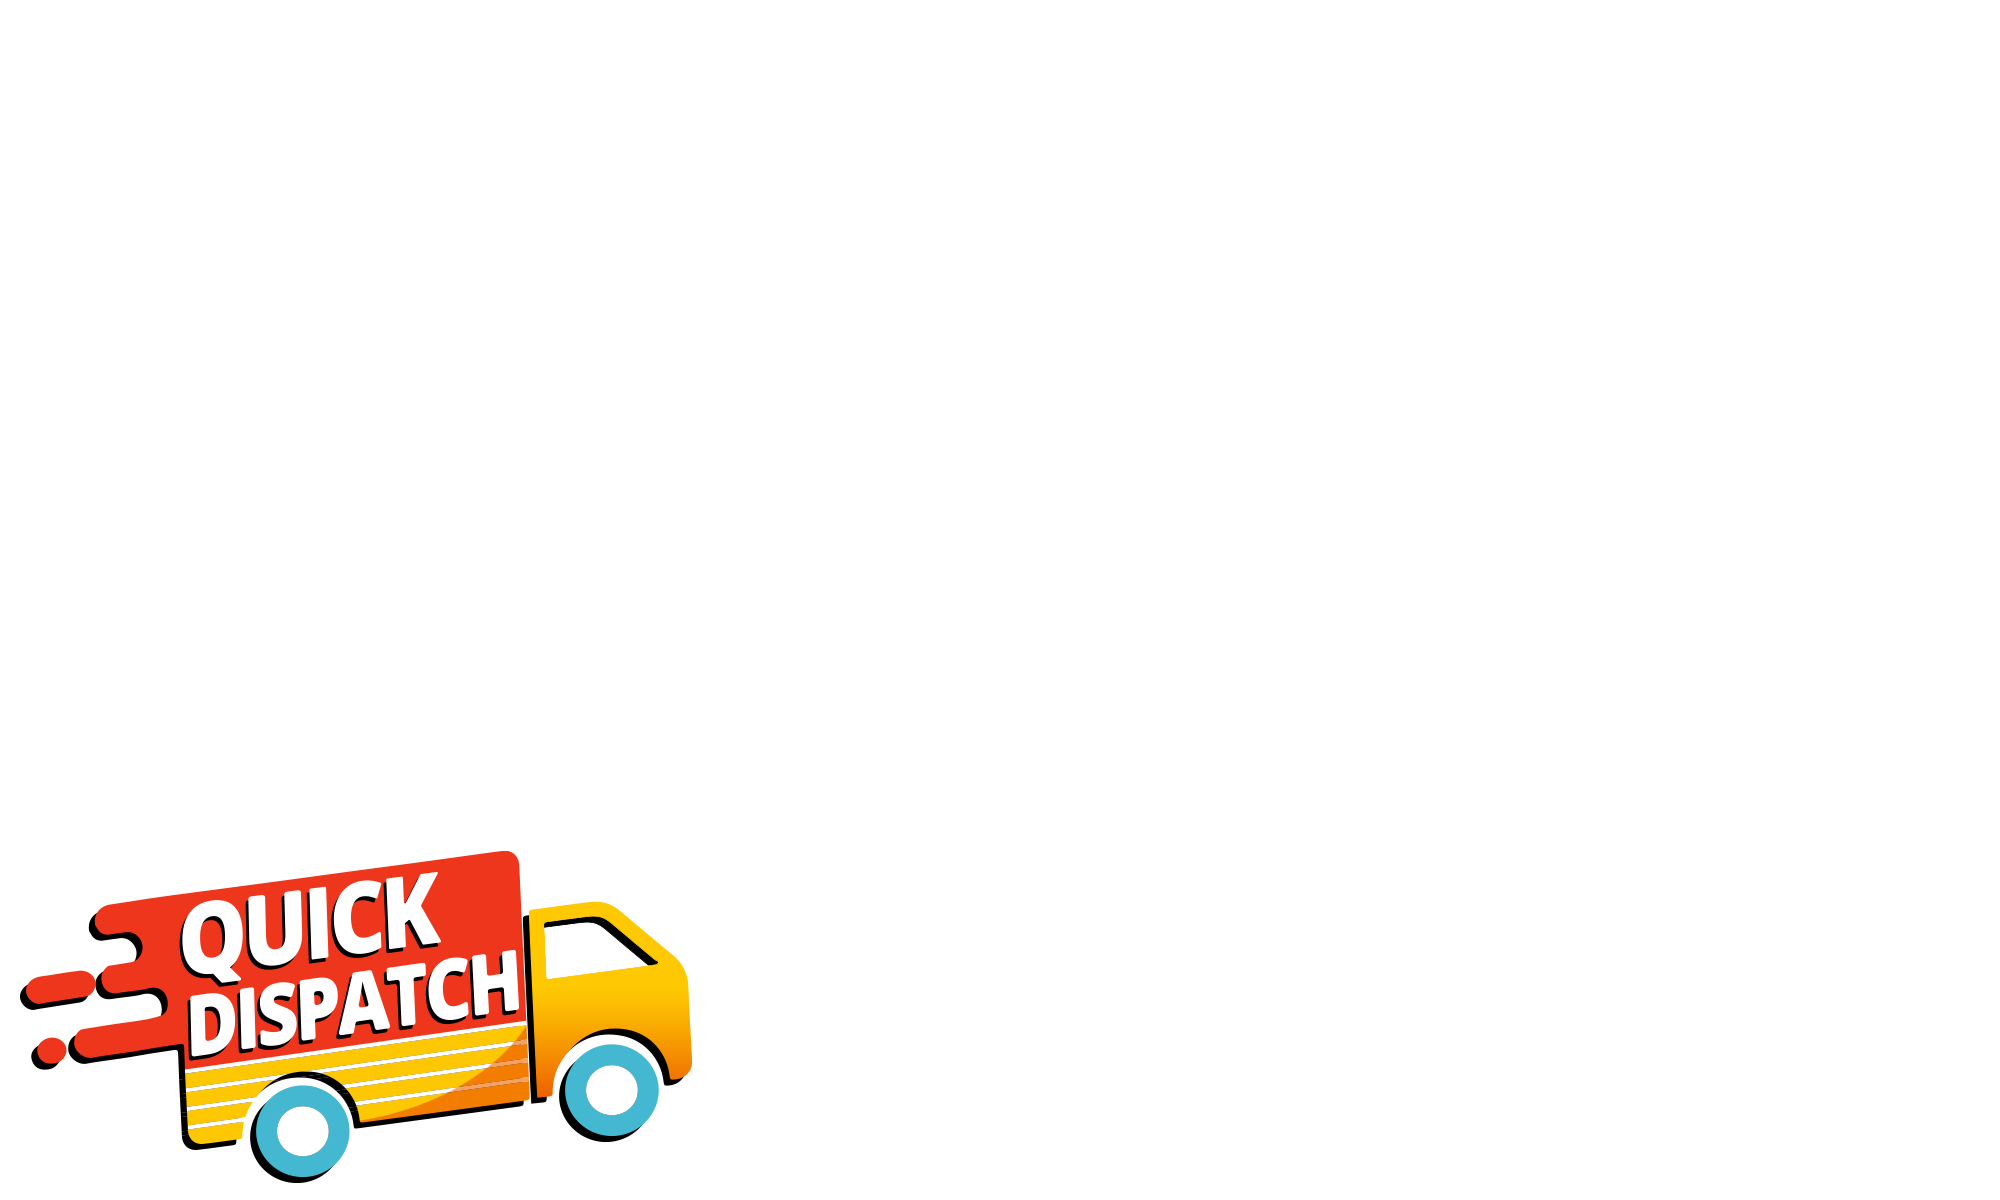 Quick dispatch overlay